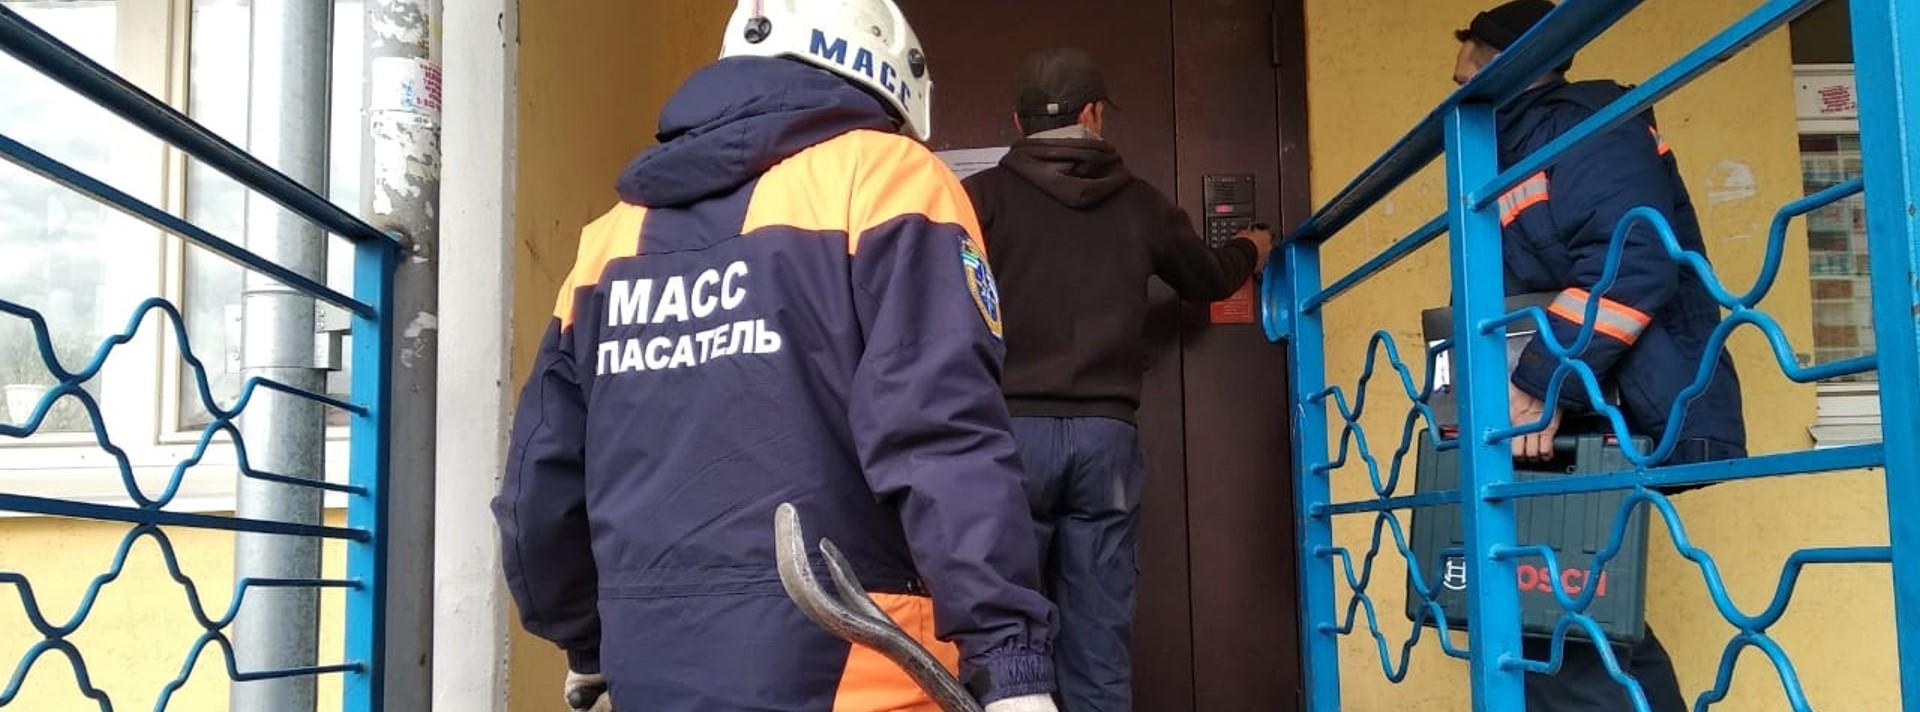 спасатели, МАСС